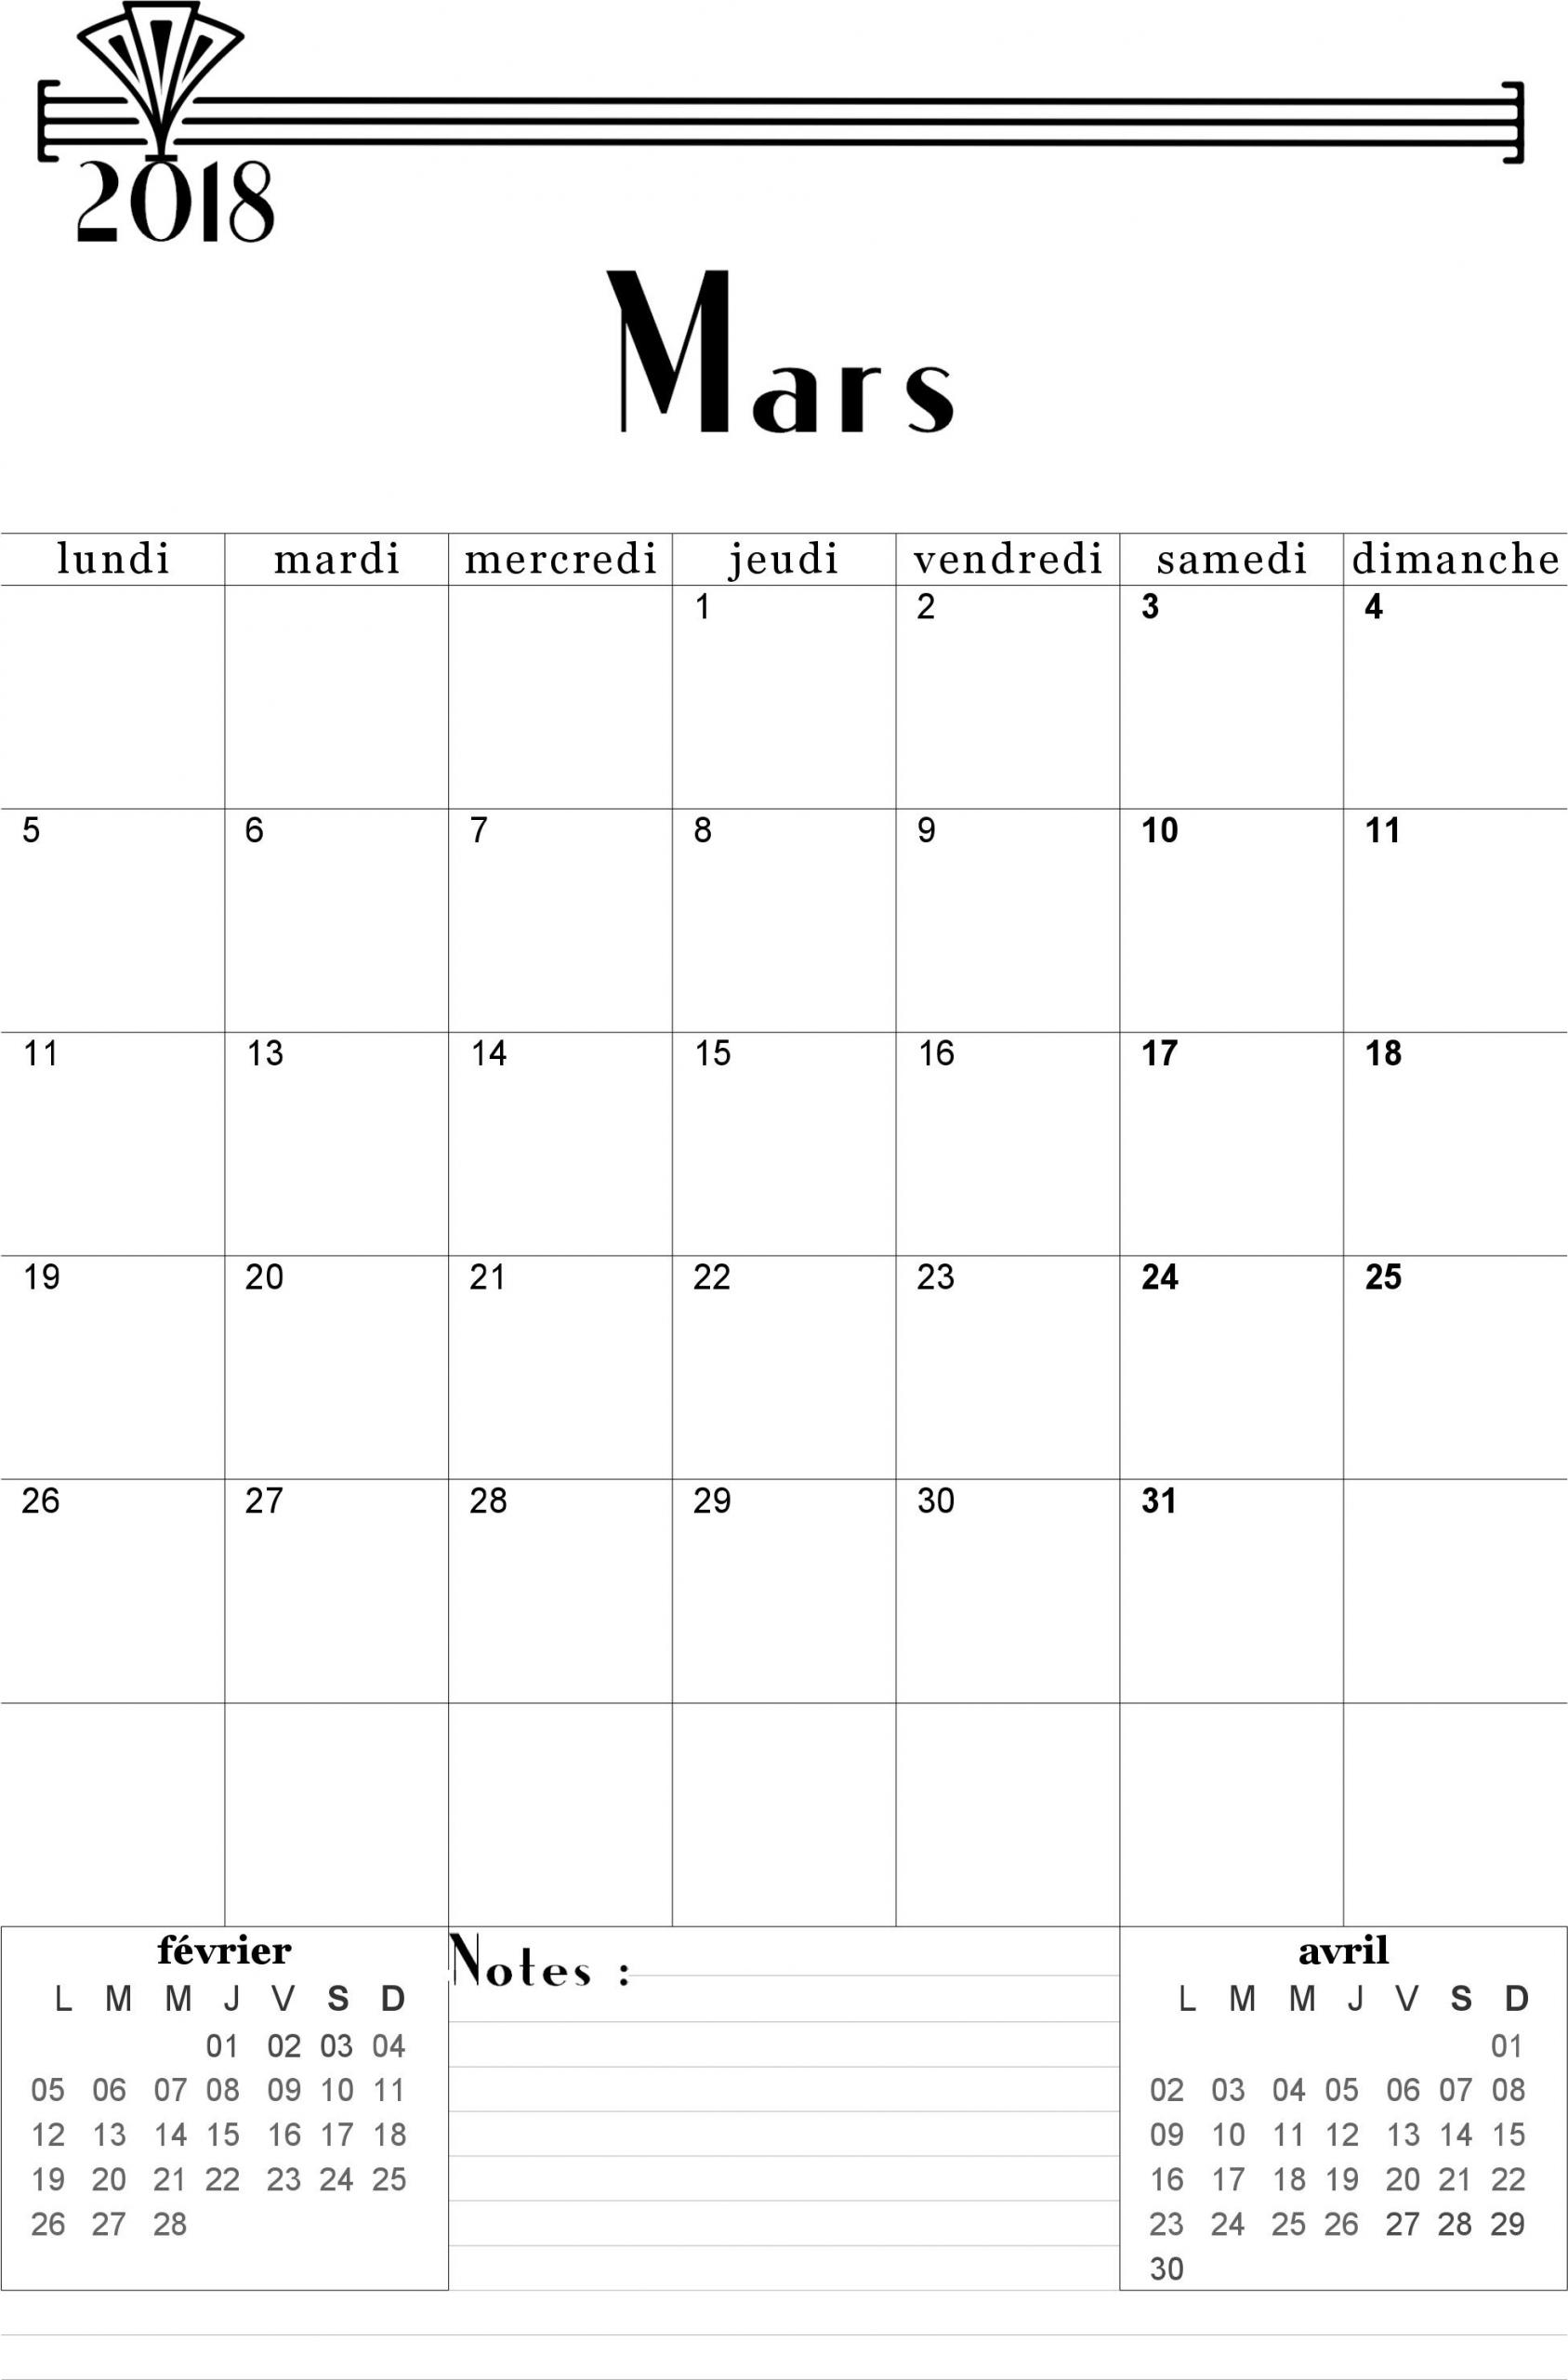 Calendrier Mars 2018 À Imprimer. | Calendrier, Calendrier serapportantà Calendrier Mars 2018 À Imprimer